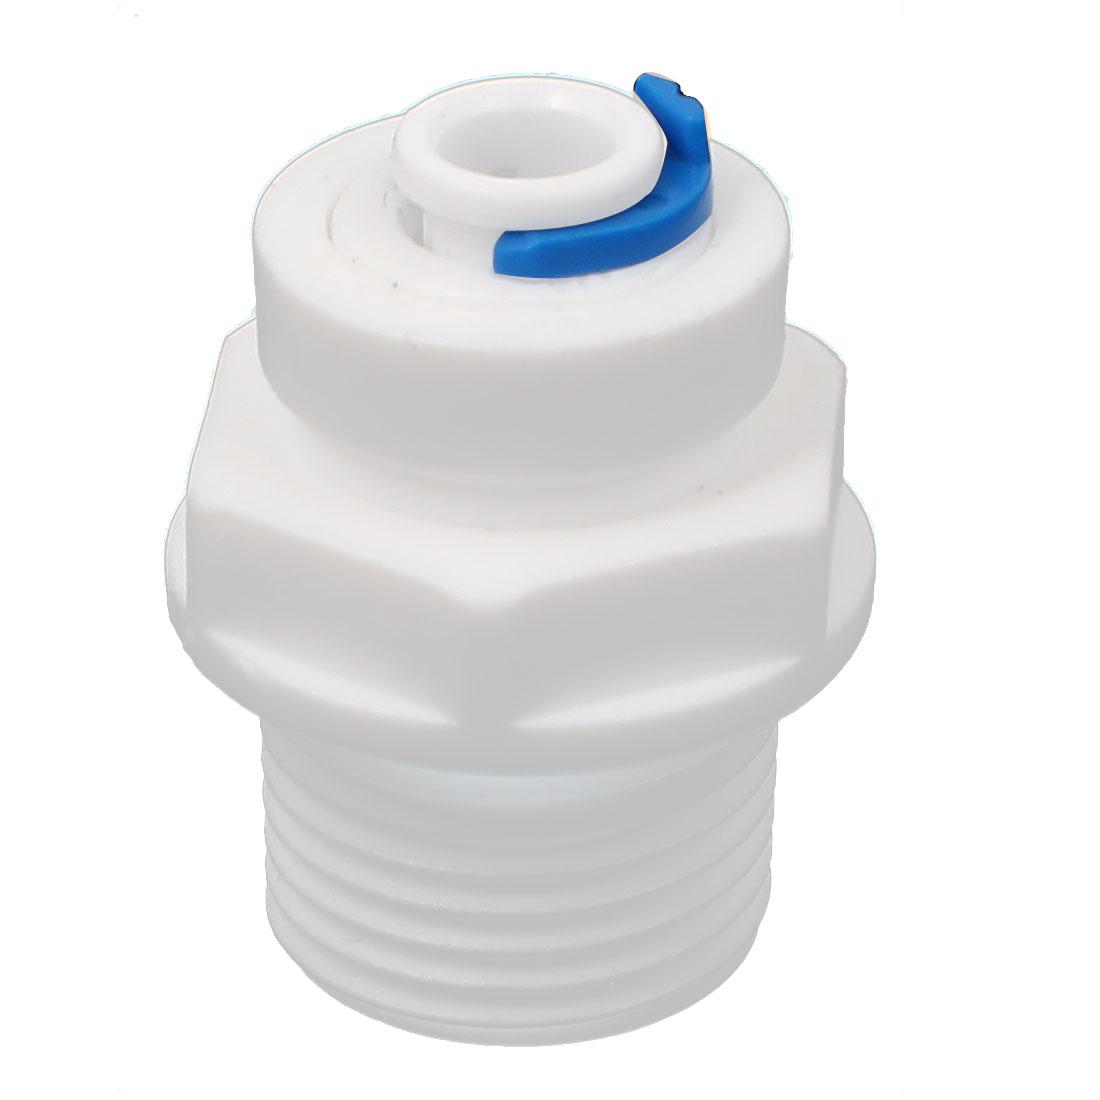 1/2 BSP Thread 6.5mm Inner Dia Plastic Water Dispenser Quick Adapter Connector